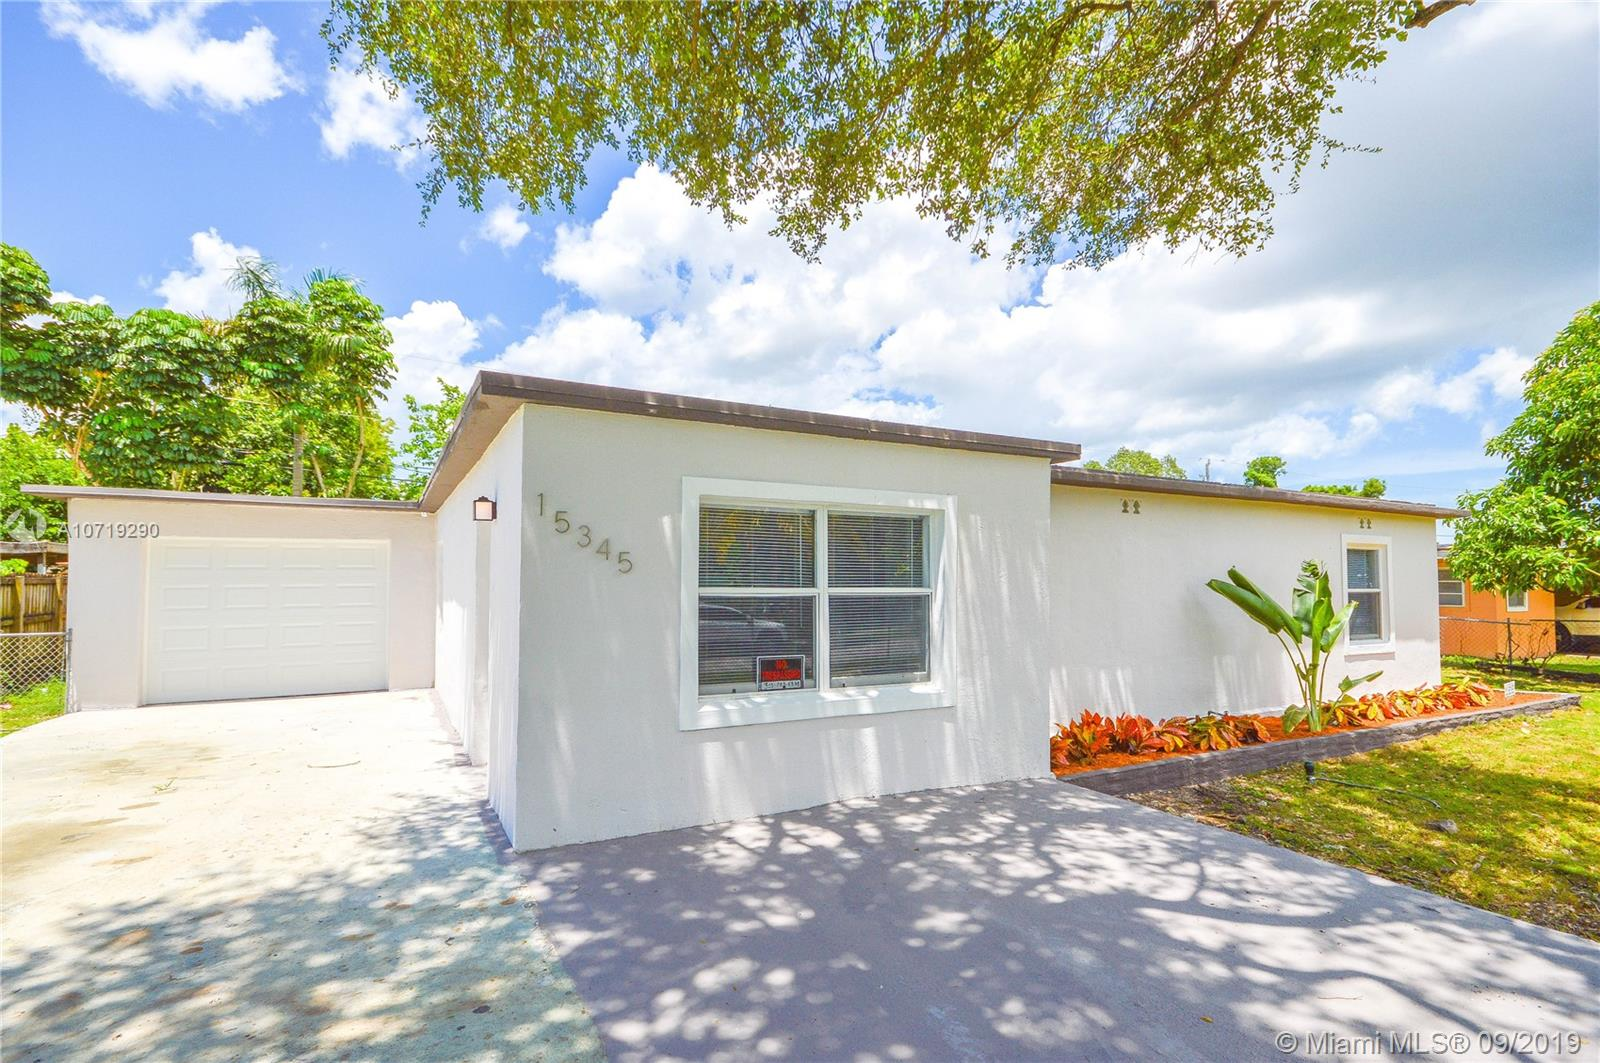 15345 Leisure Dr, Homestead, FL 33033 - Homestead, FL real estate listing